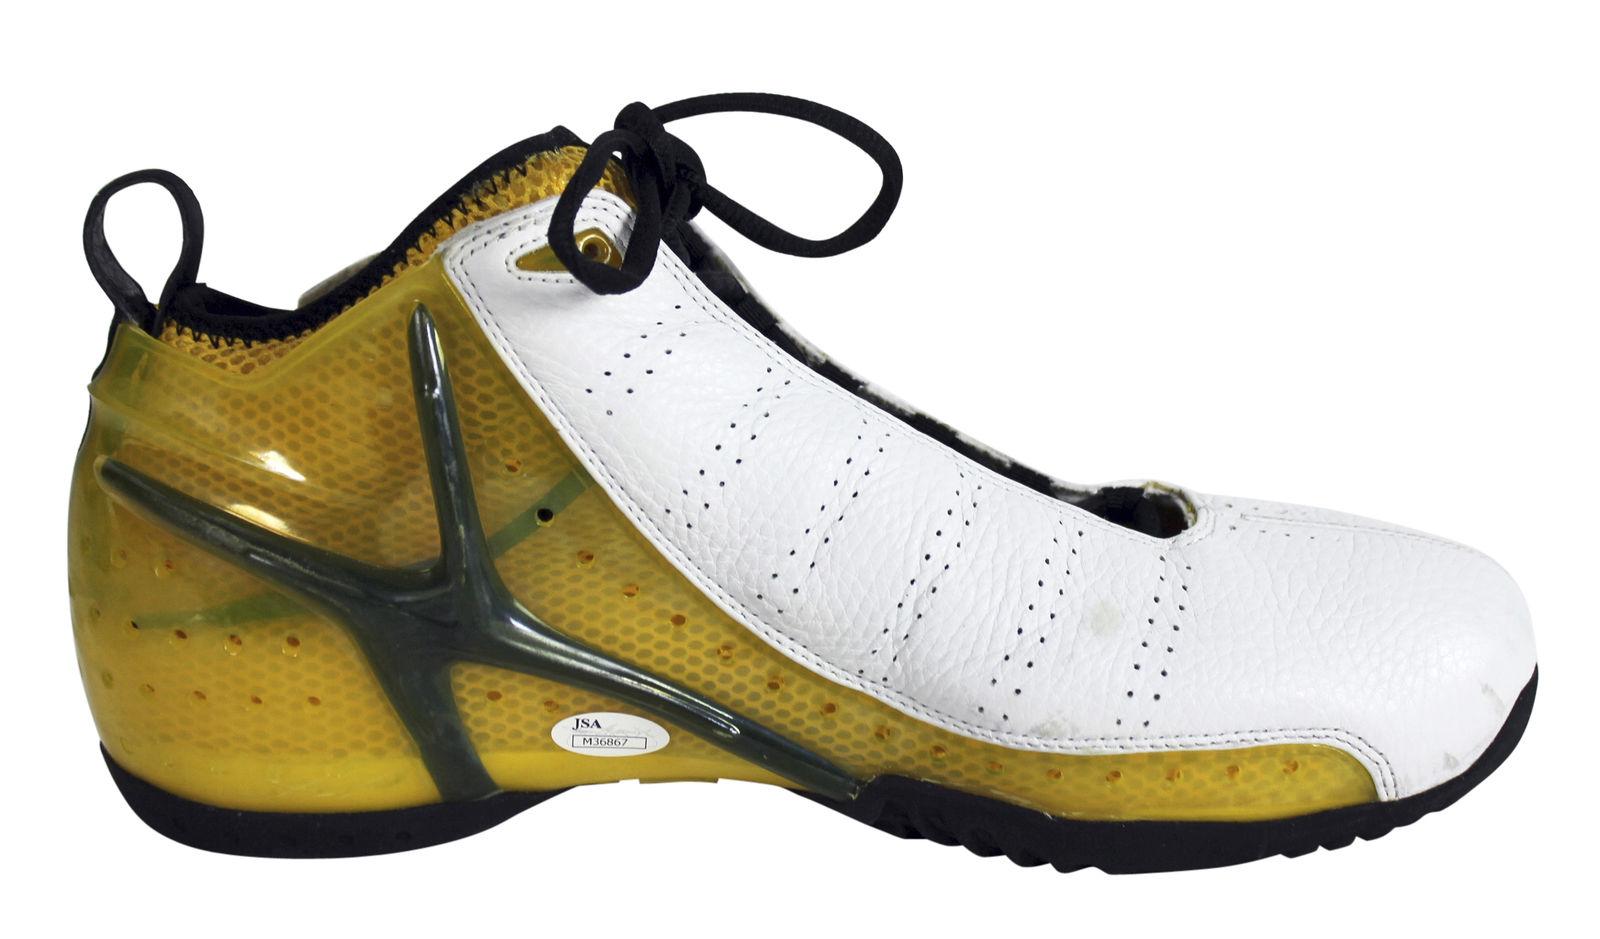 251925f764c 2002 Gary Payton Game Worn   Signed Personal Model Basketball Sneakers (JSA  ...